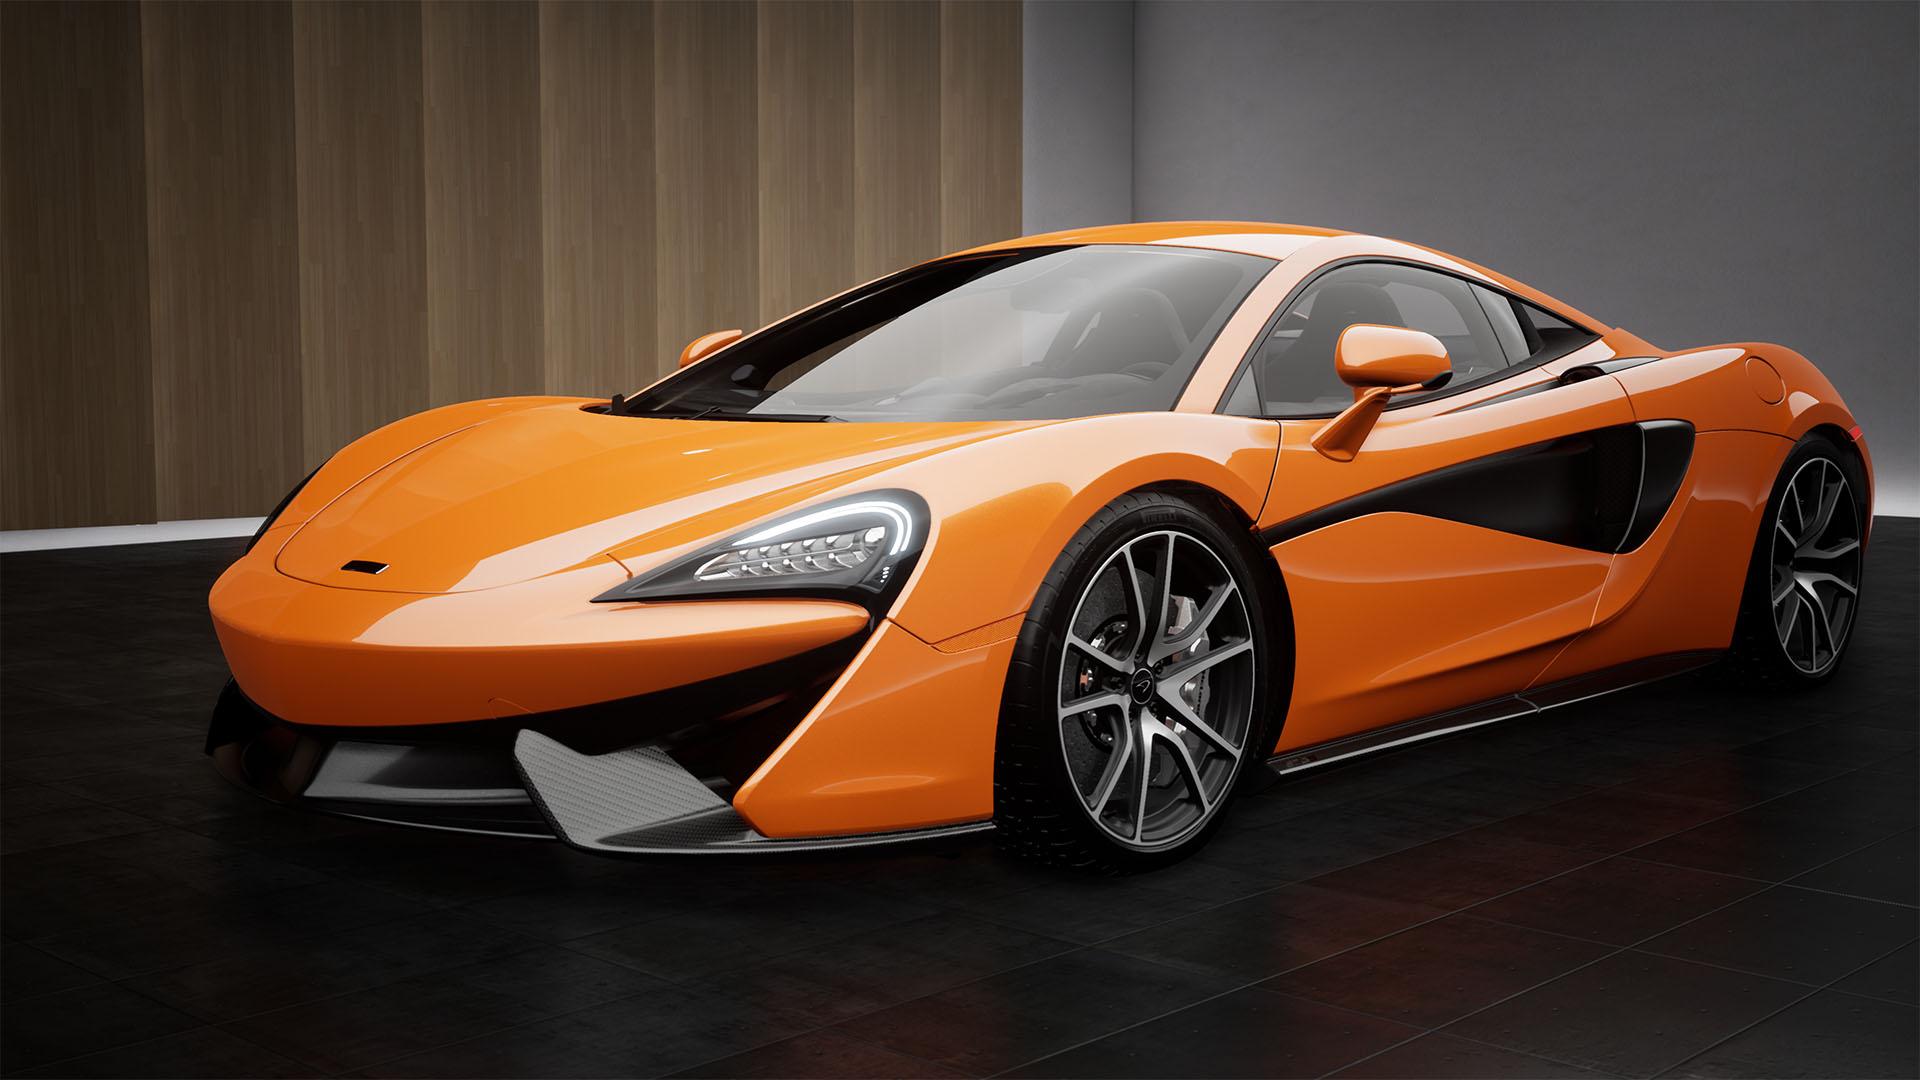 Store_AutomotiveMaterialPack-Car.jpg